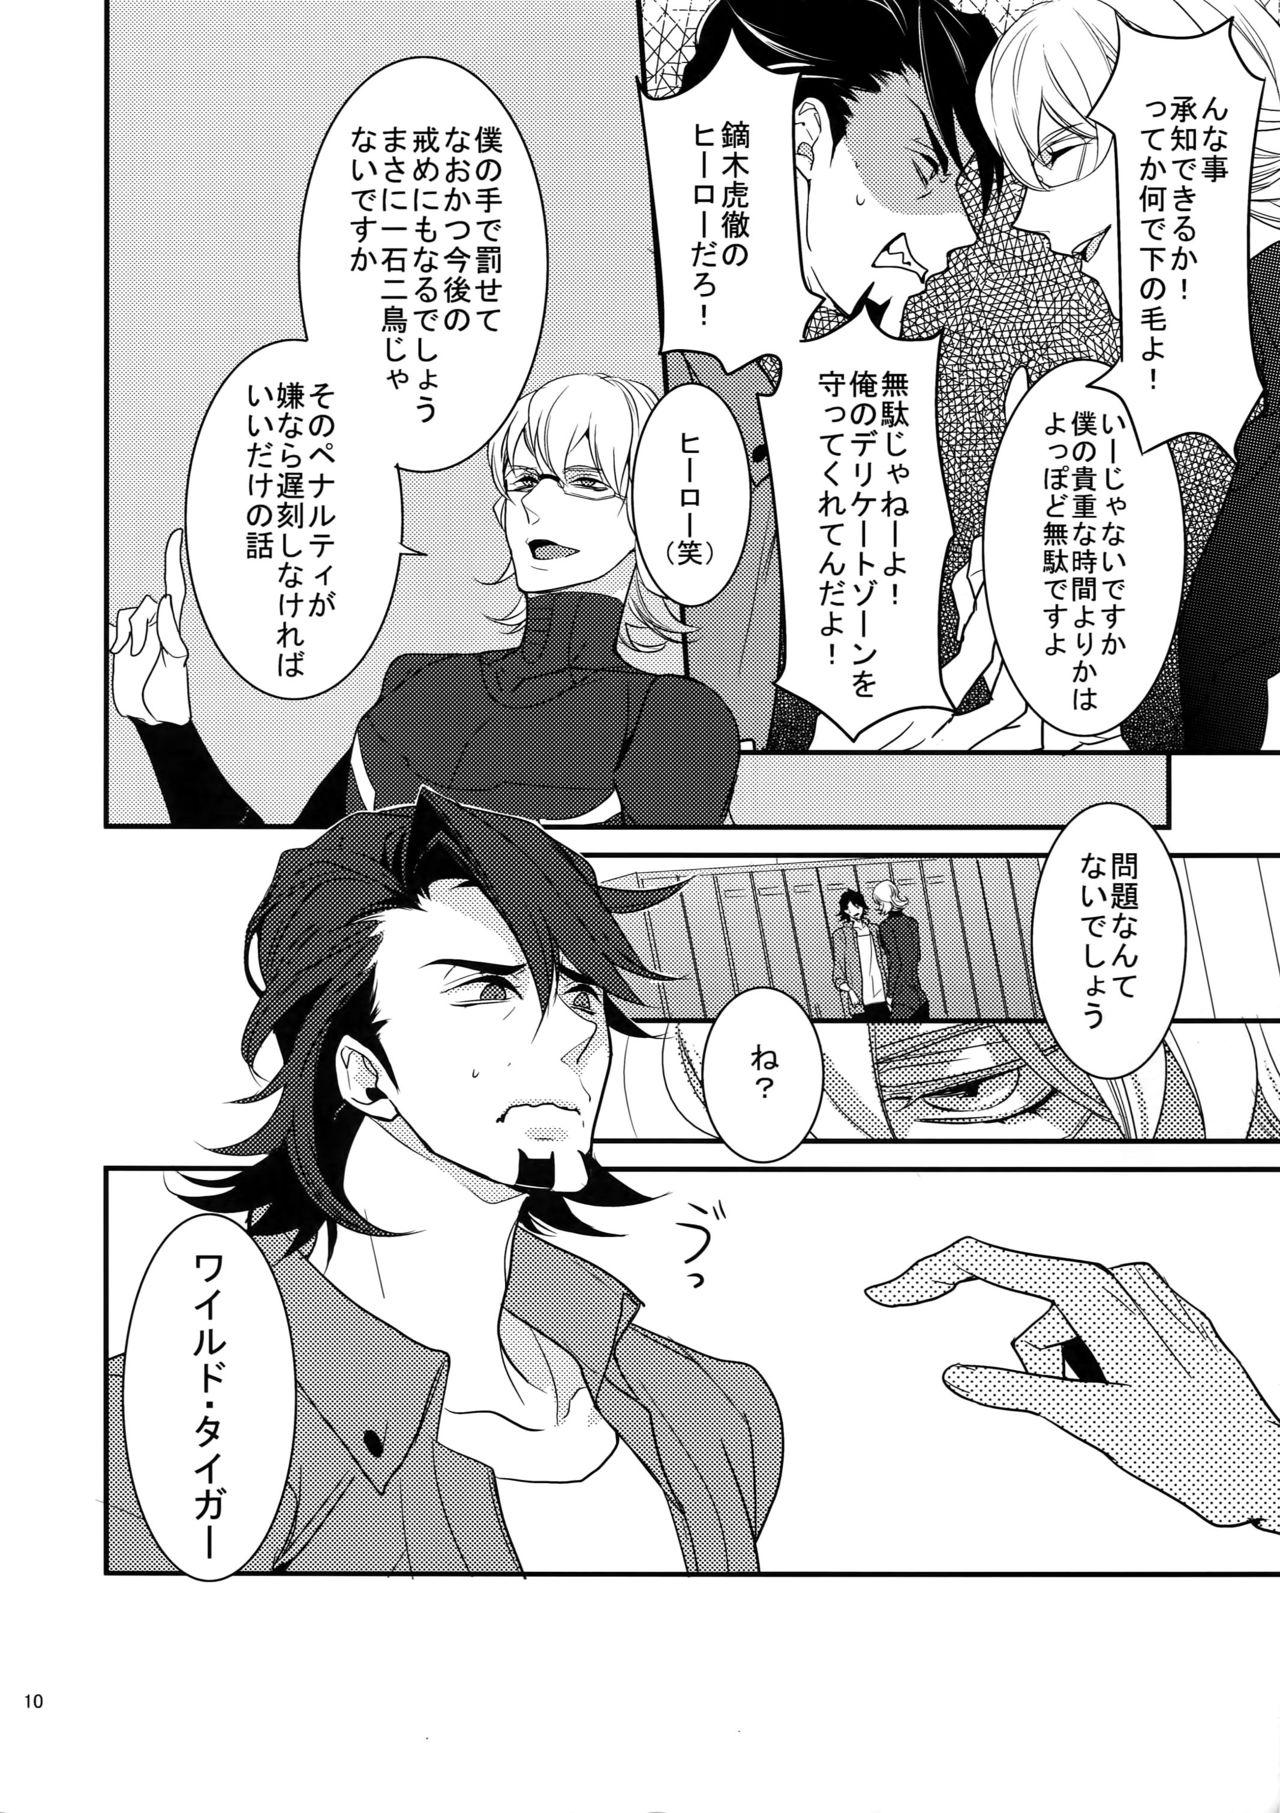 BOROZS Usagi Tora Sairoku 8